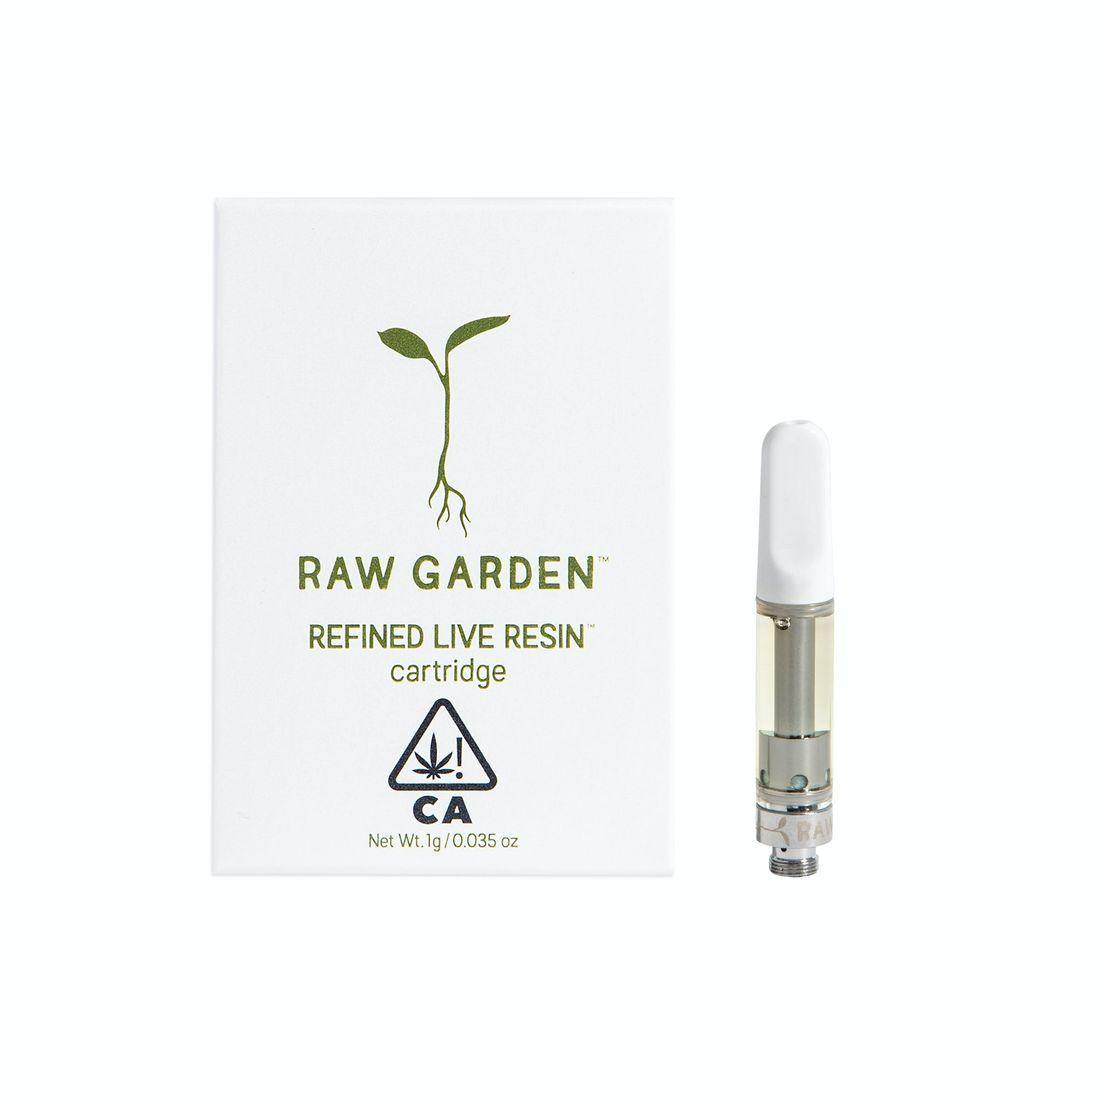 (PRE-ORDER ONLY) Guavamelon -1g Cart (84.75%THC) Raw Garden